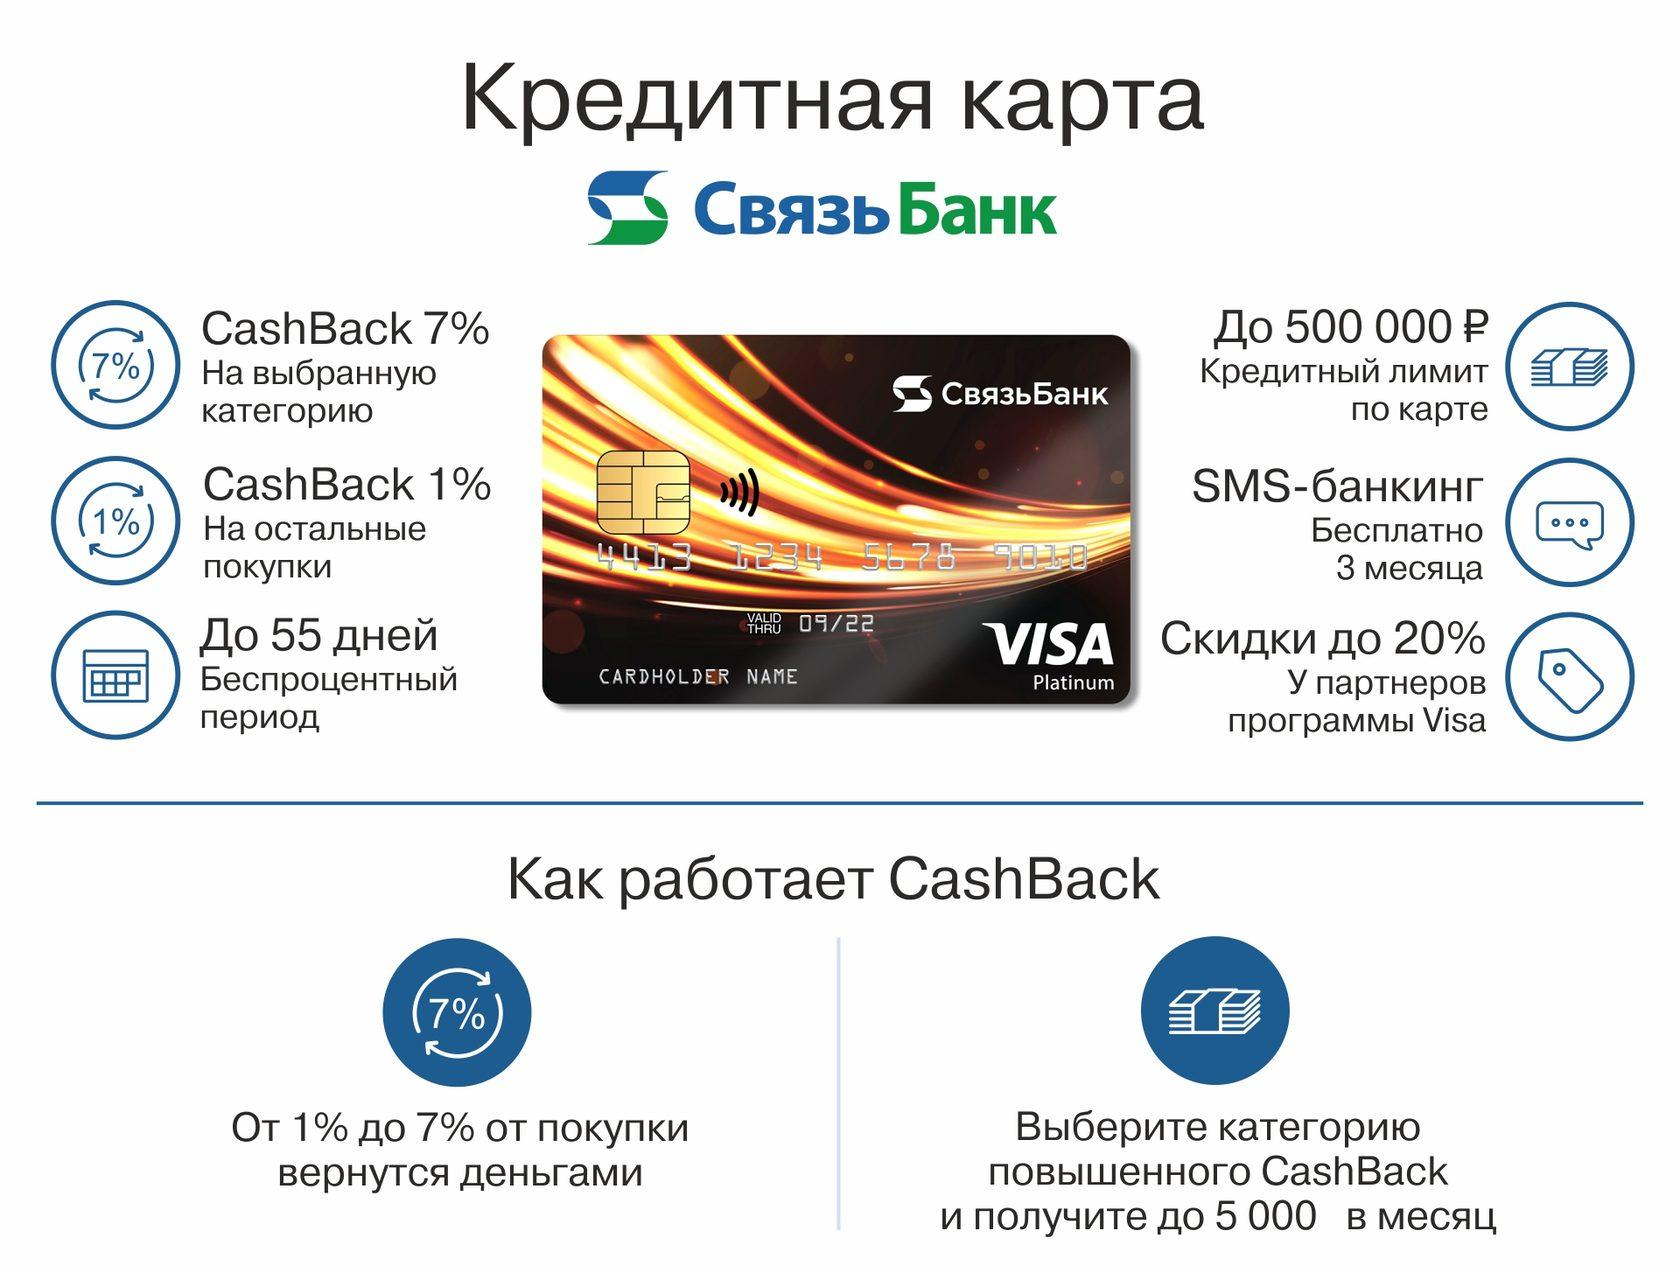 svyaz-bank-kreditnye-karty_12